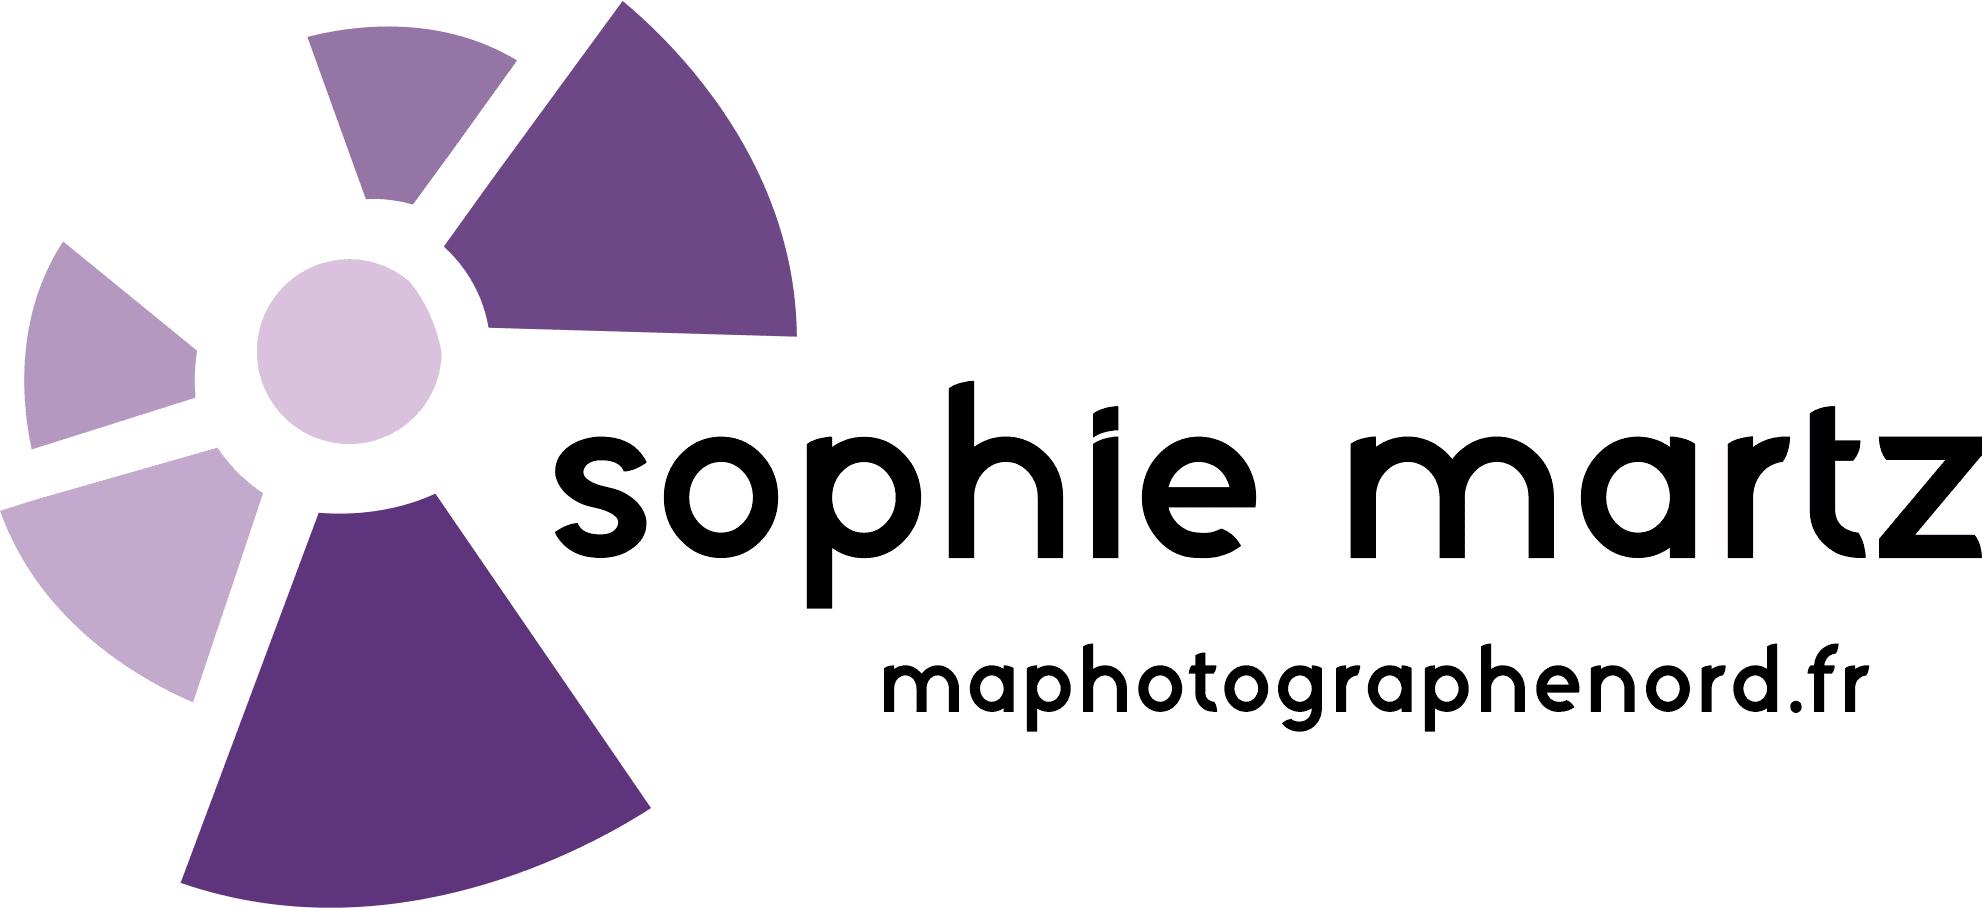 Logo d entreprise photo, Sophie Martz, Maphotographenord.fr